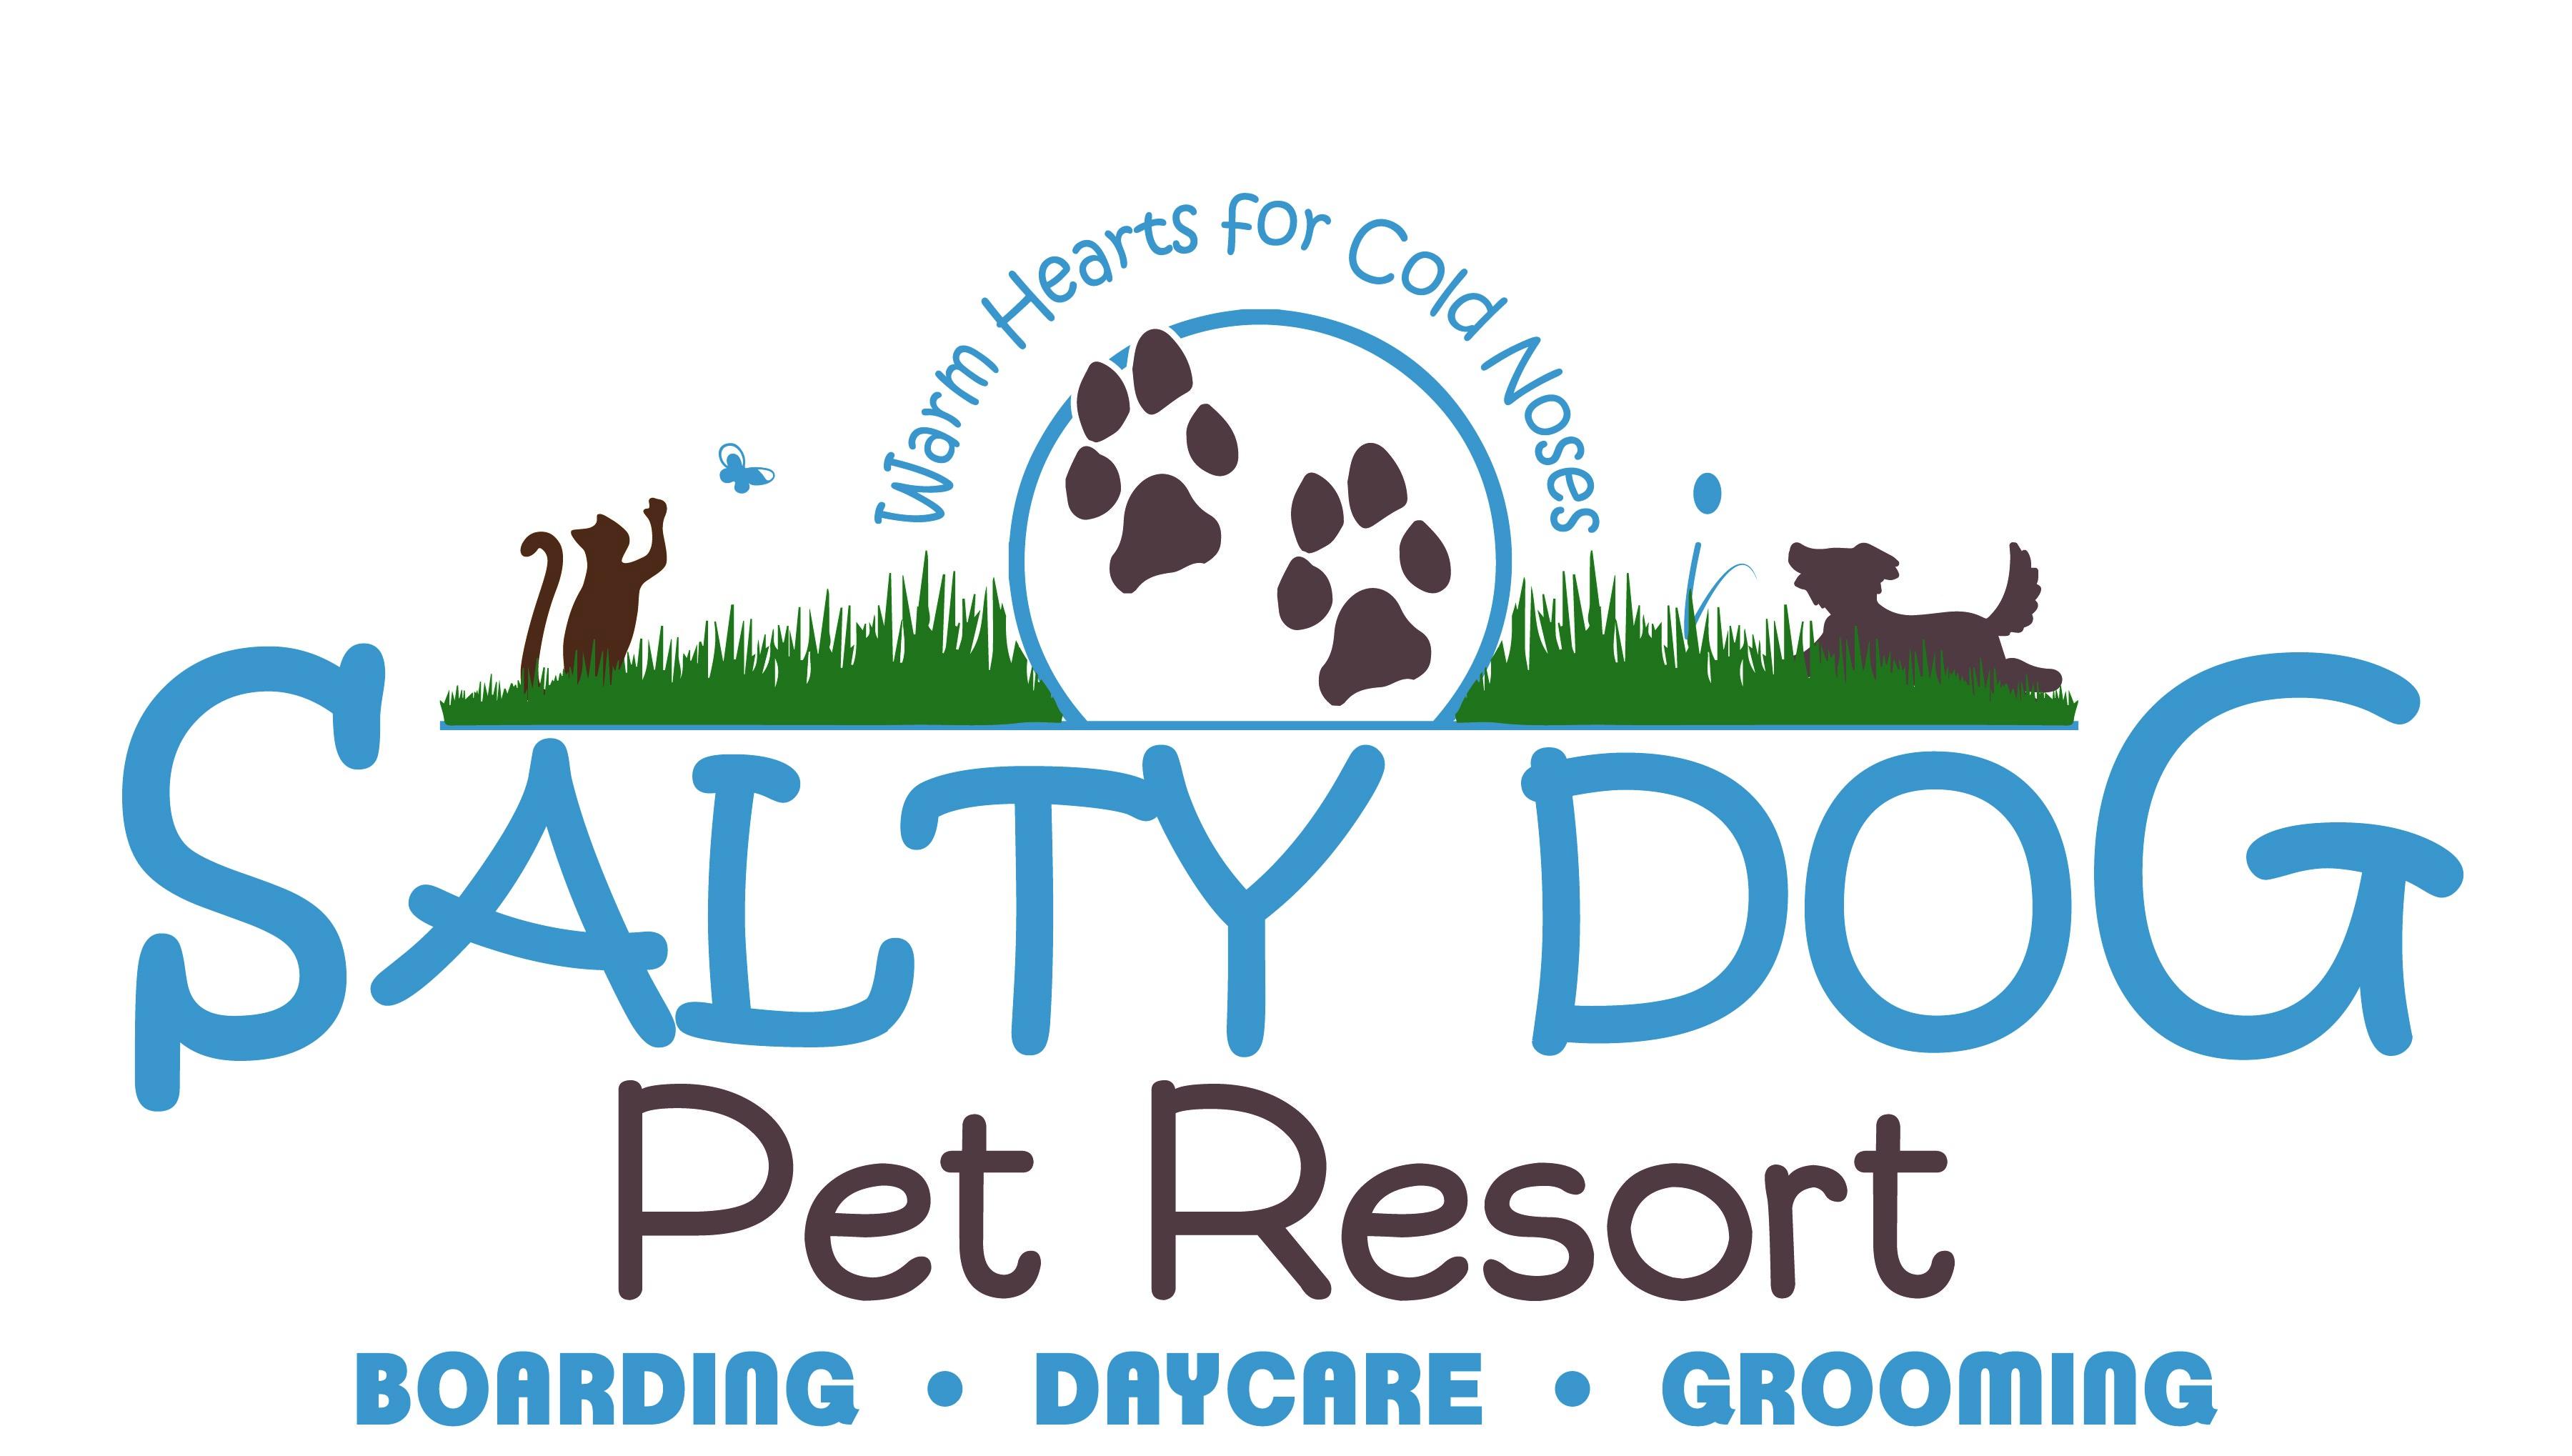 BookMy Pet - Customer Portal for Pet Grooming, Boarding